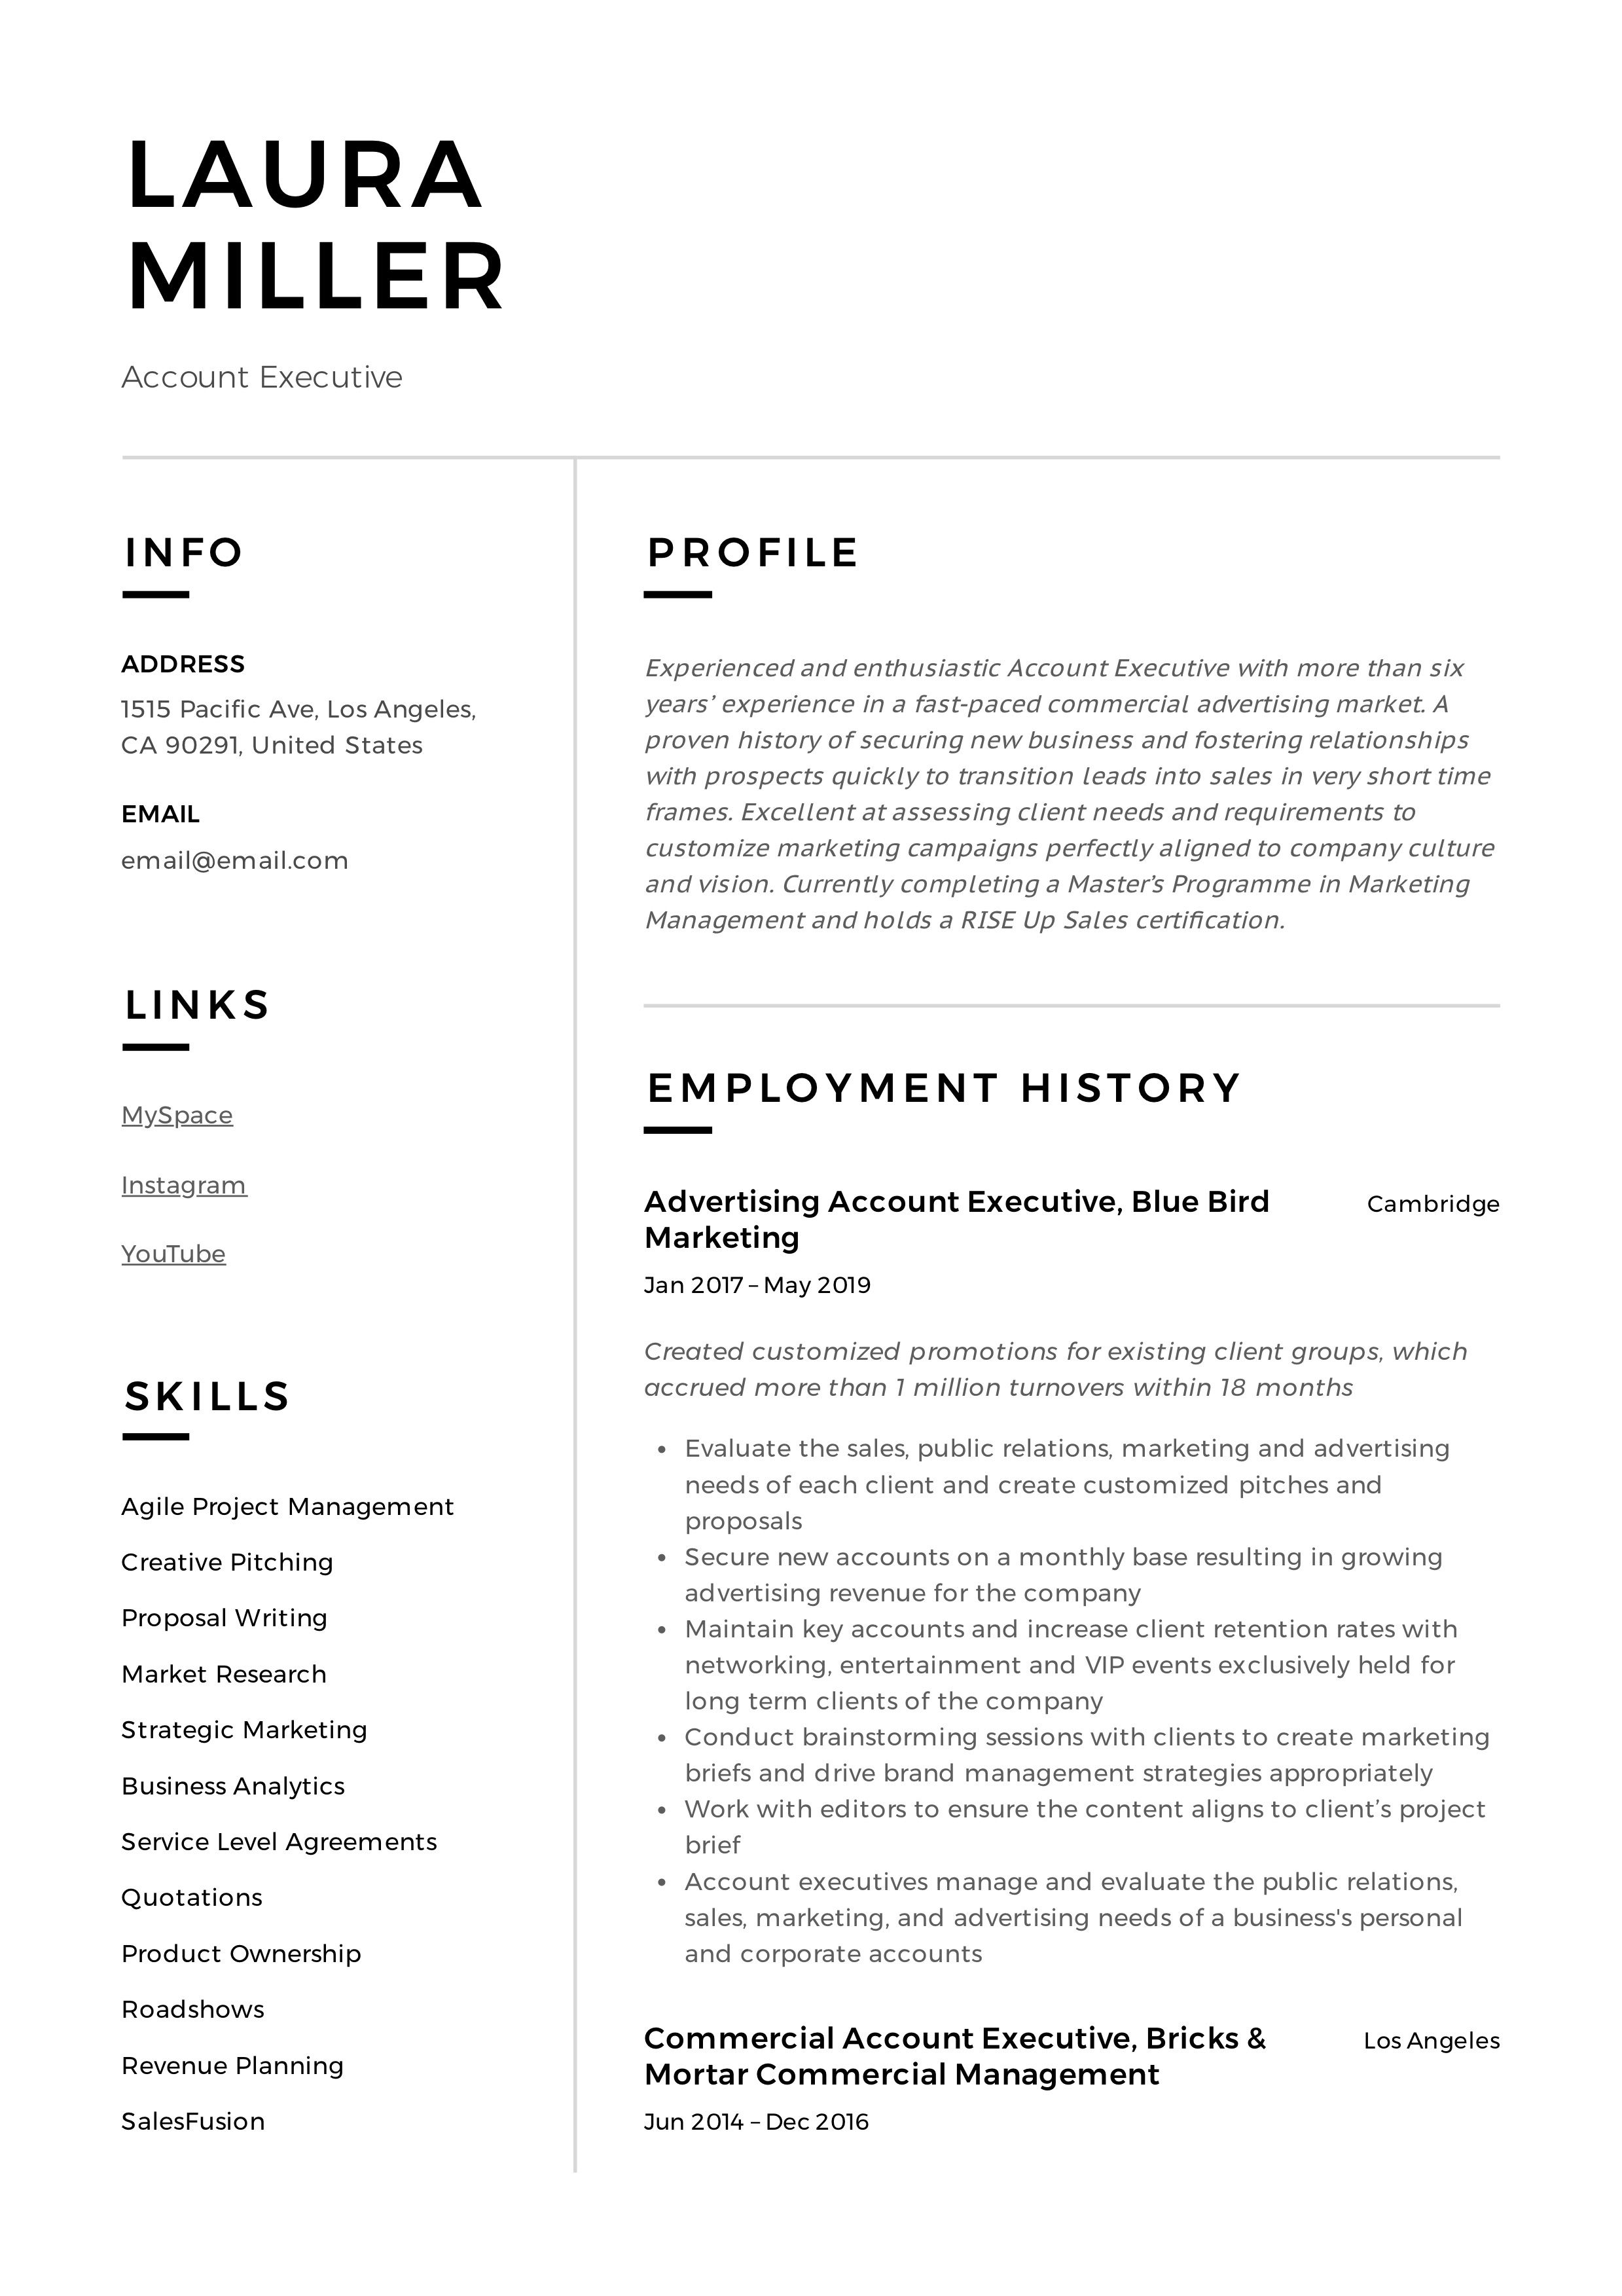 Professional Account Executive Resume, template, design